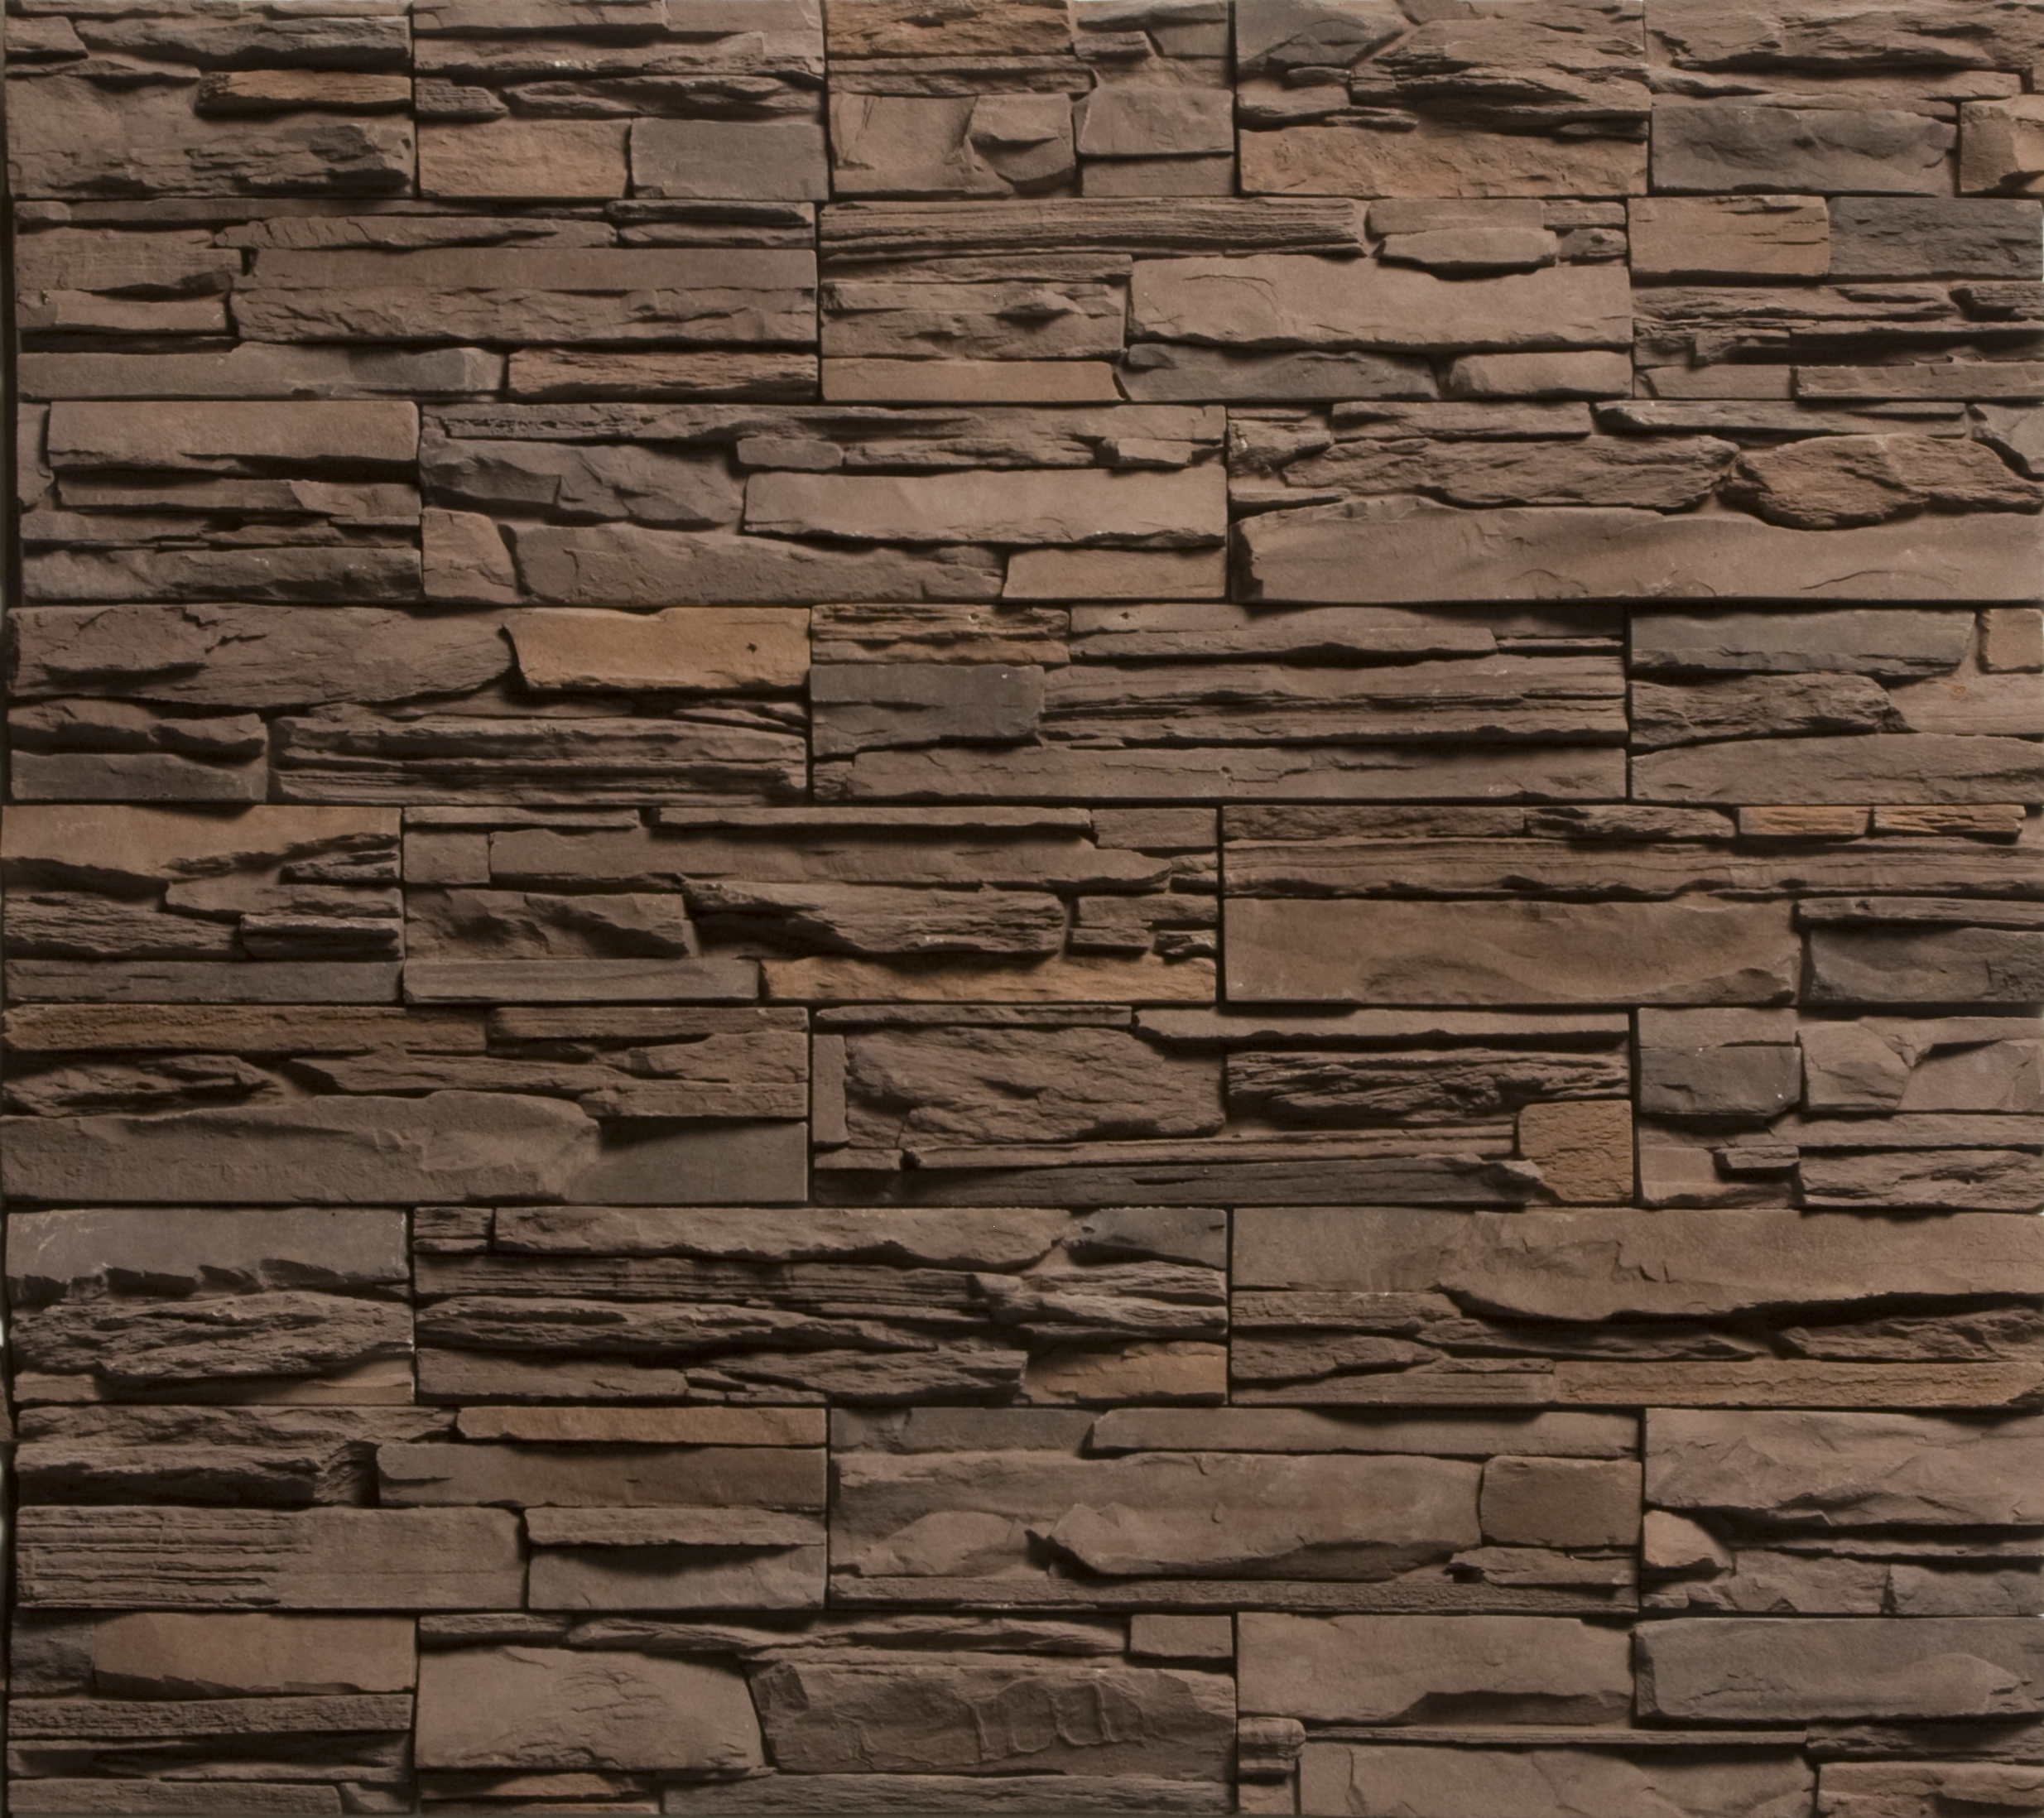 stone wall texture stone 2469x2196